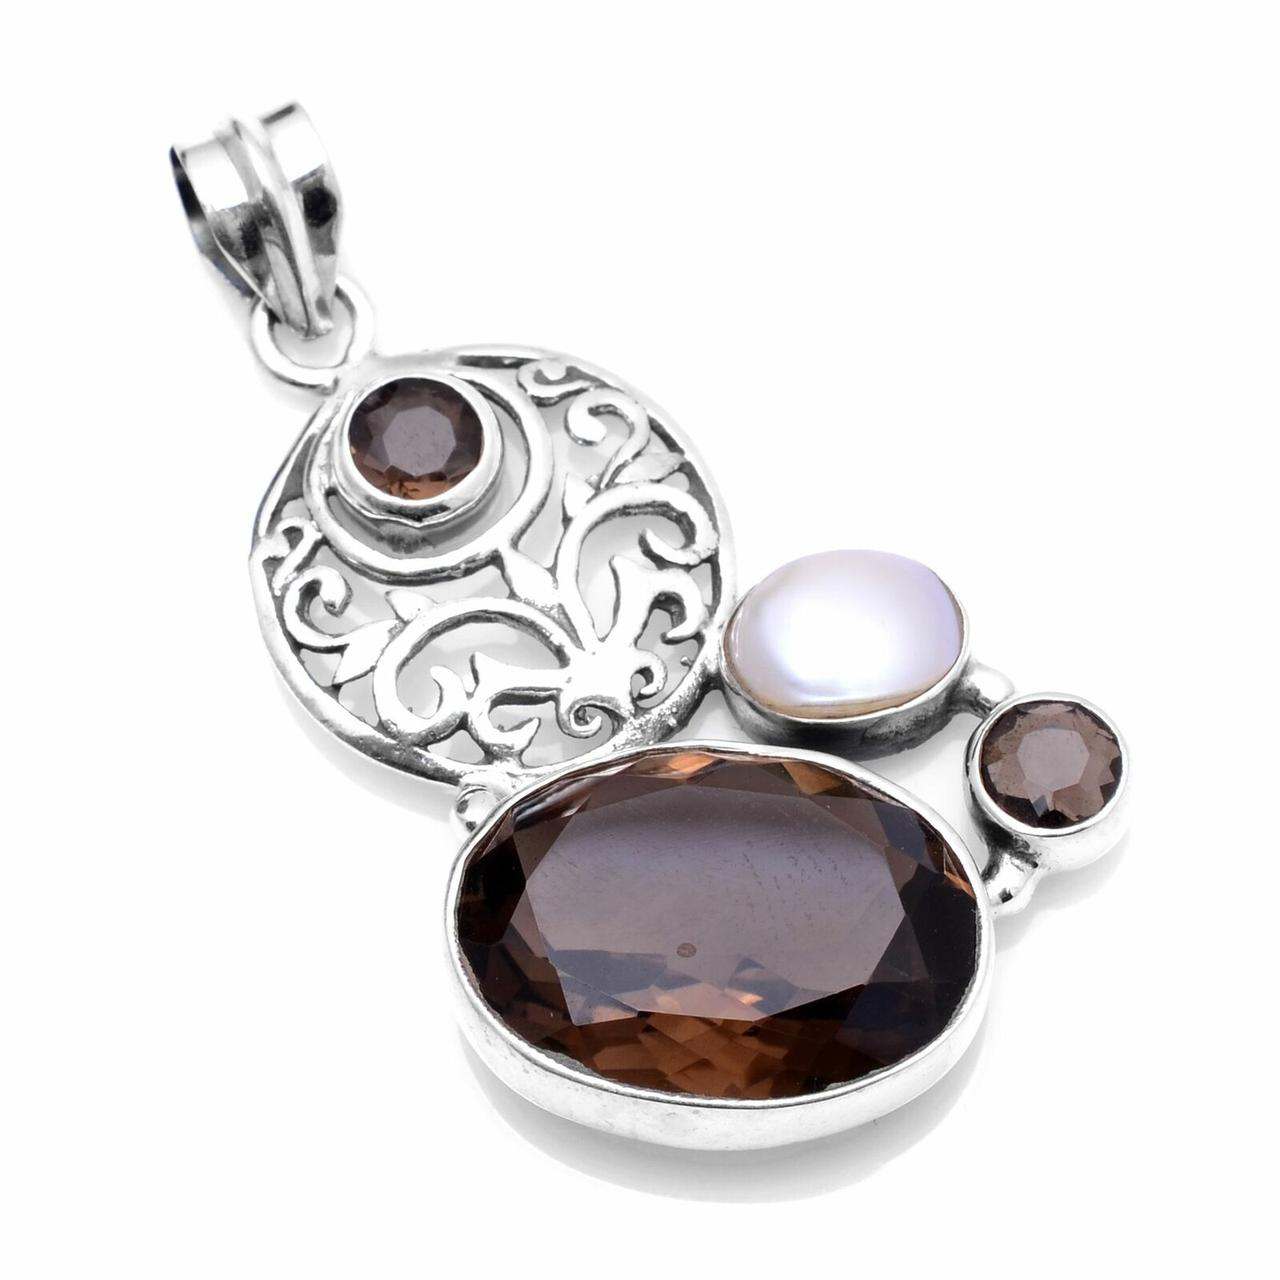 Кулон из серебра с натуральным раухтопазом дымчатым кварцем и жемчугом, 534ПР